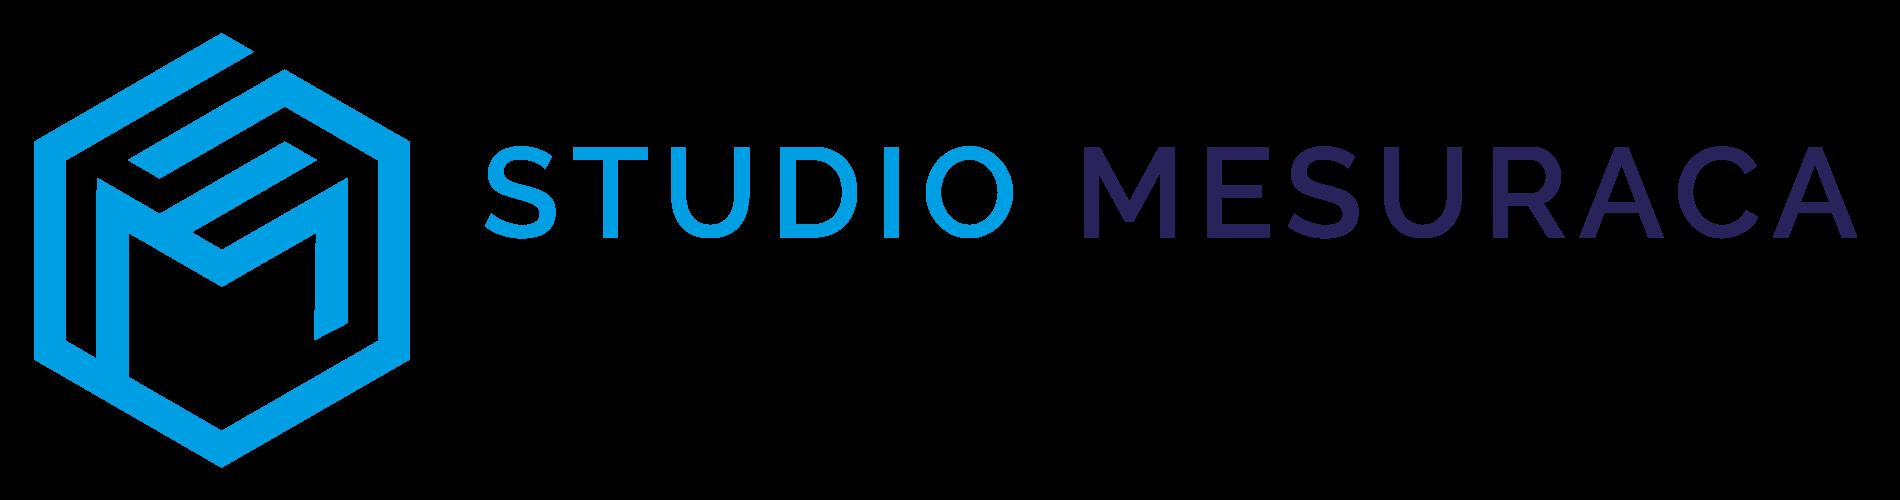 Studio Mesuraca